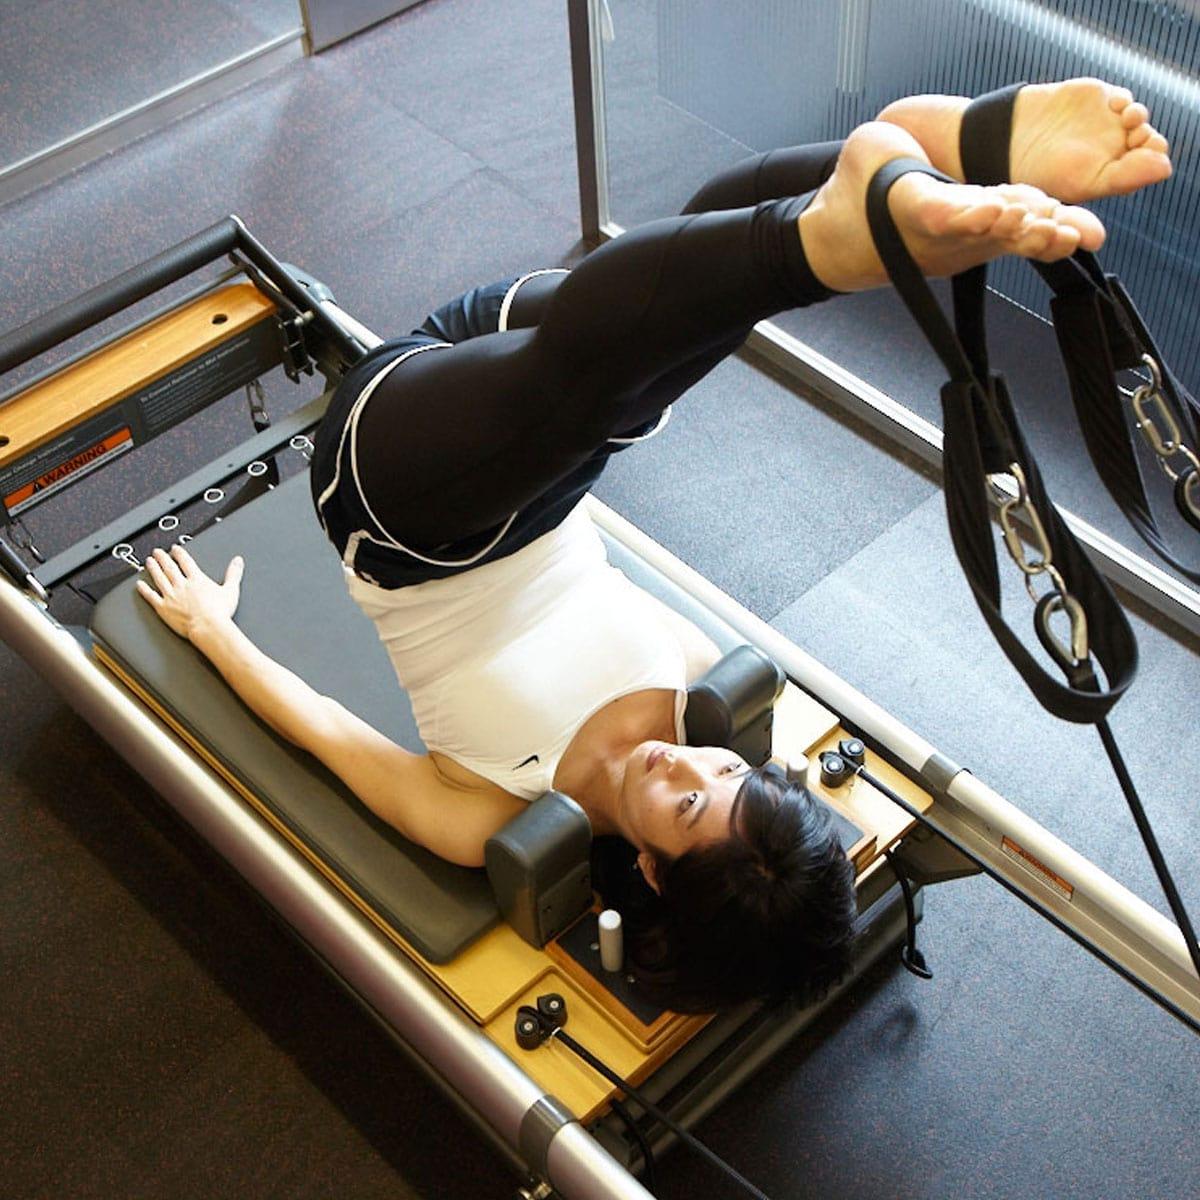 PRE-TRAINING Physion MD / Supreme Vision / TWRCON / P-up Stretch TW Yoga / TWRF / TW PILATES / TWSL / TWSWTH プレトレーニング